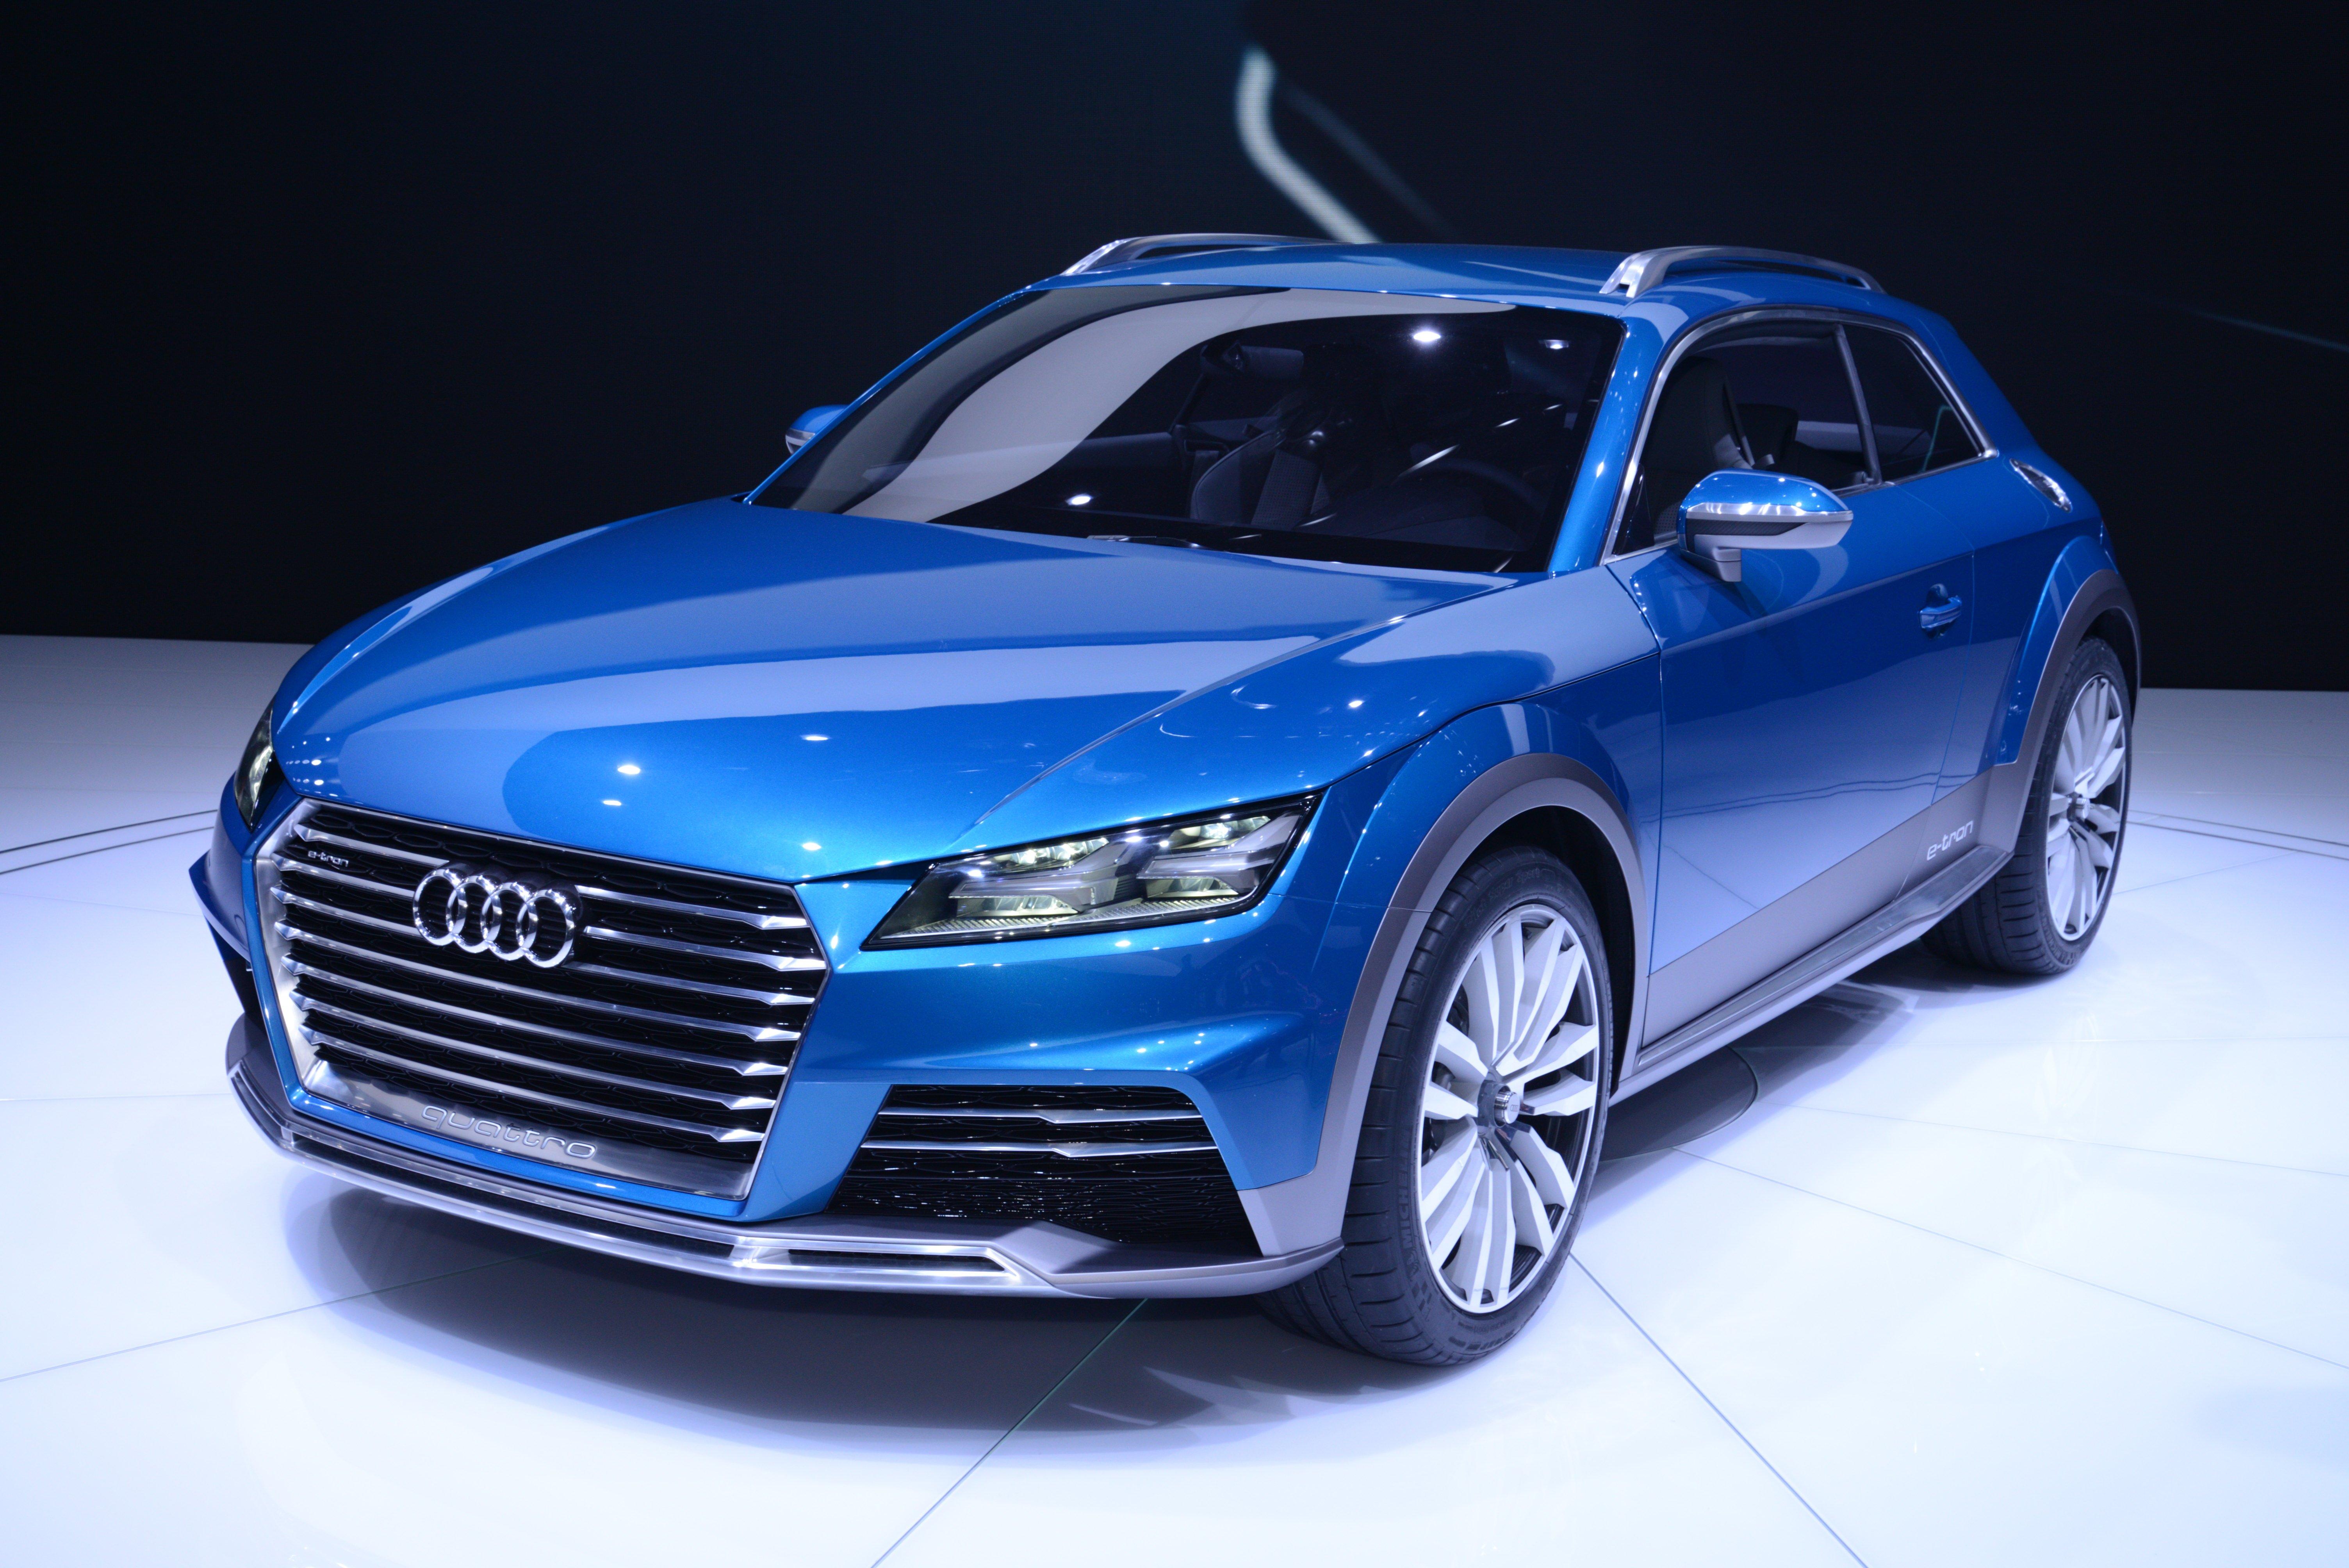 Next Generation Audi Tt Previewed As Audi Allroad Shooting